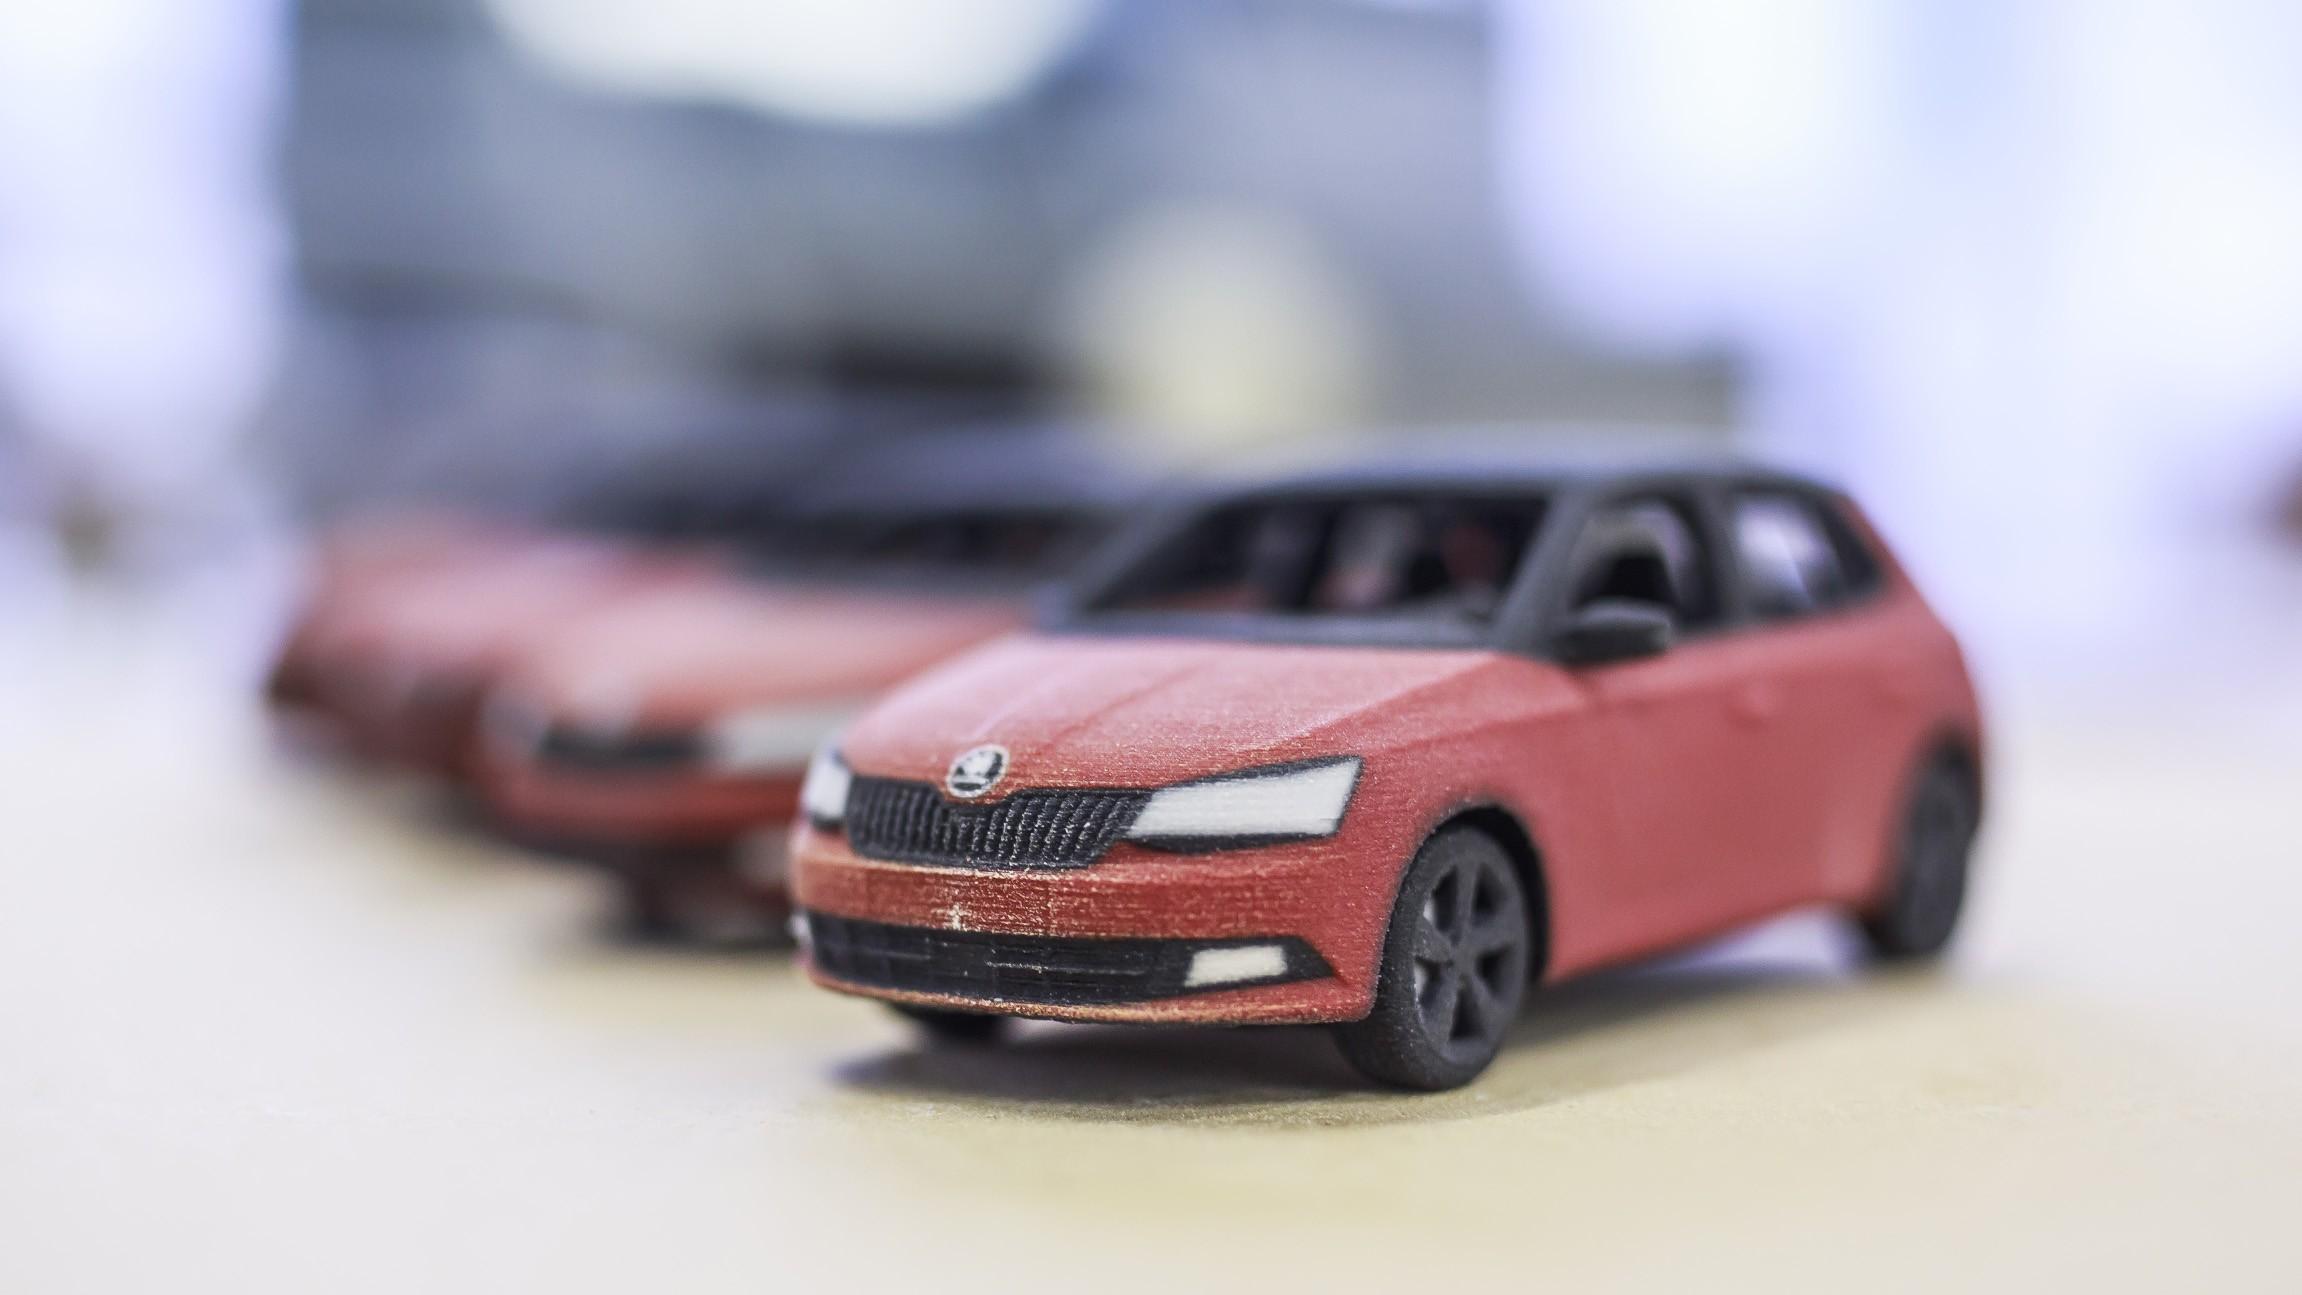 Mass Customization with 3D printing